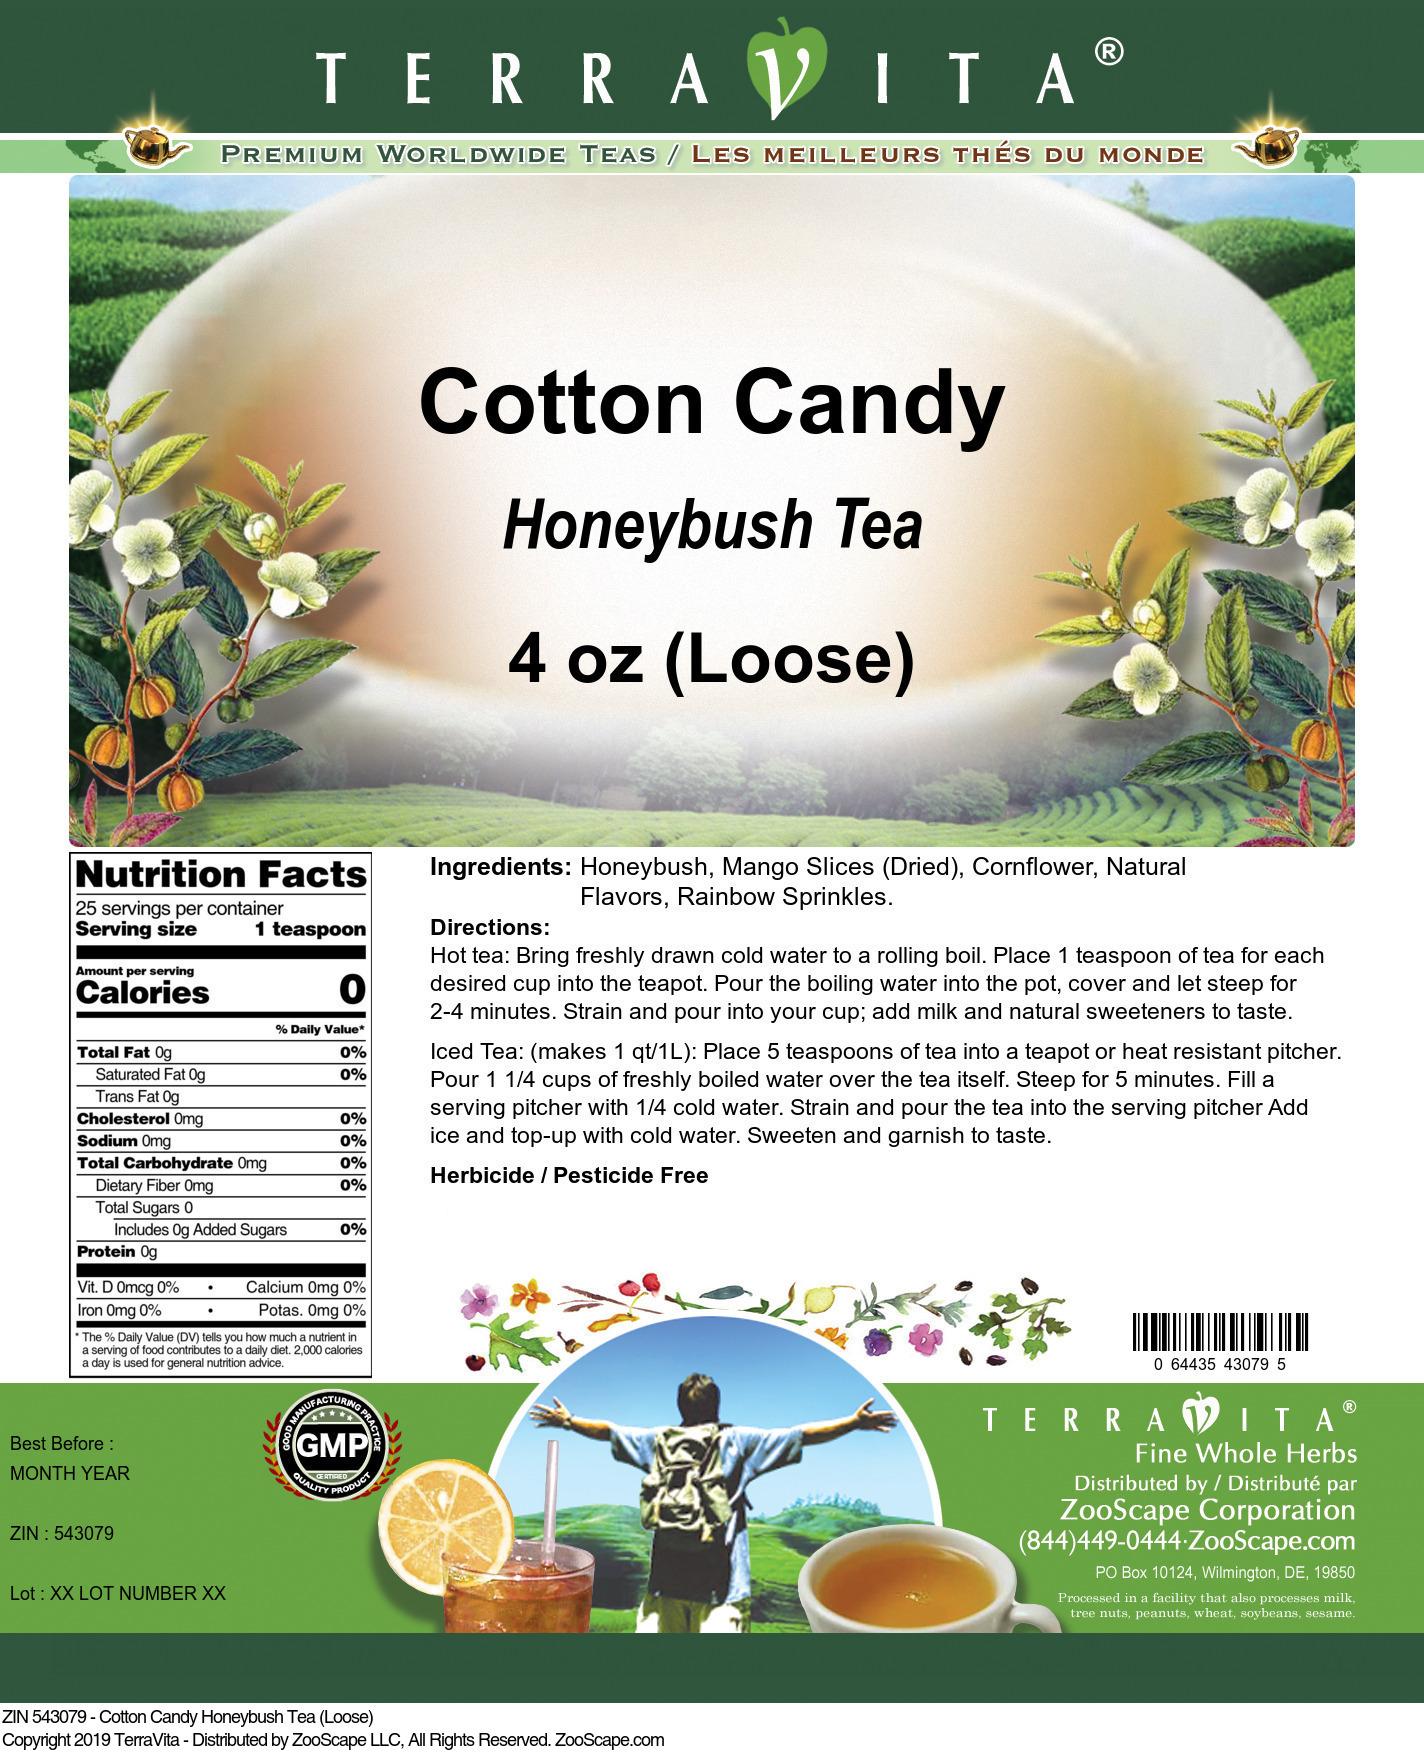 Cotton Candy Honeybush Tea (Loose)